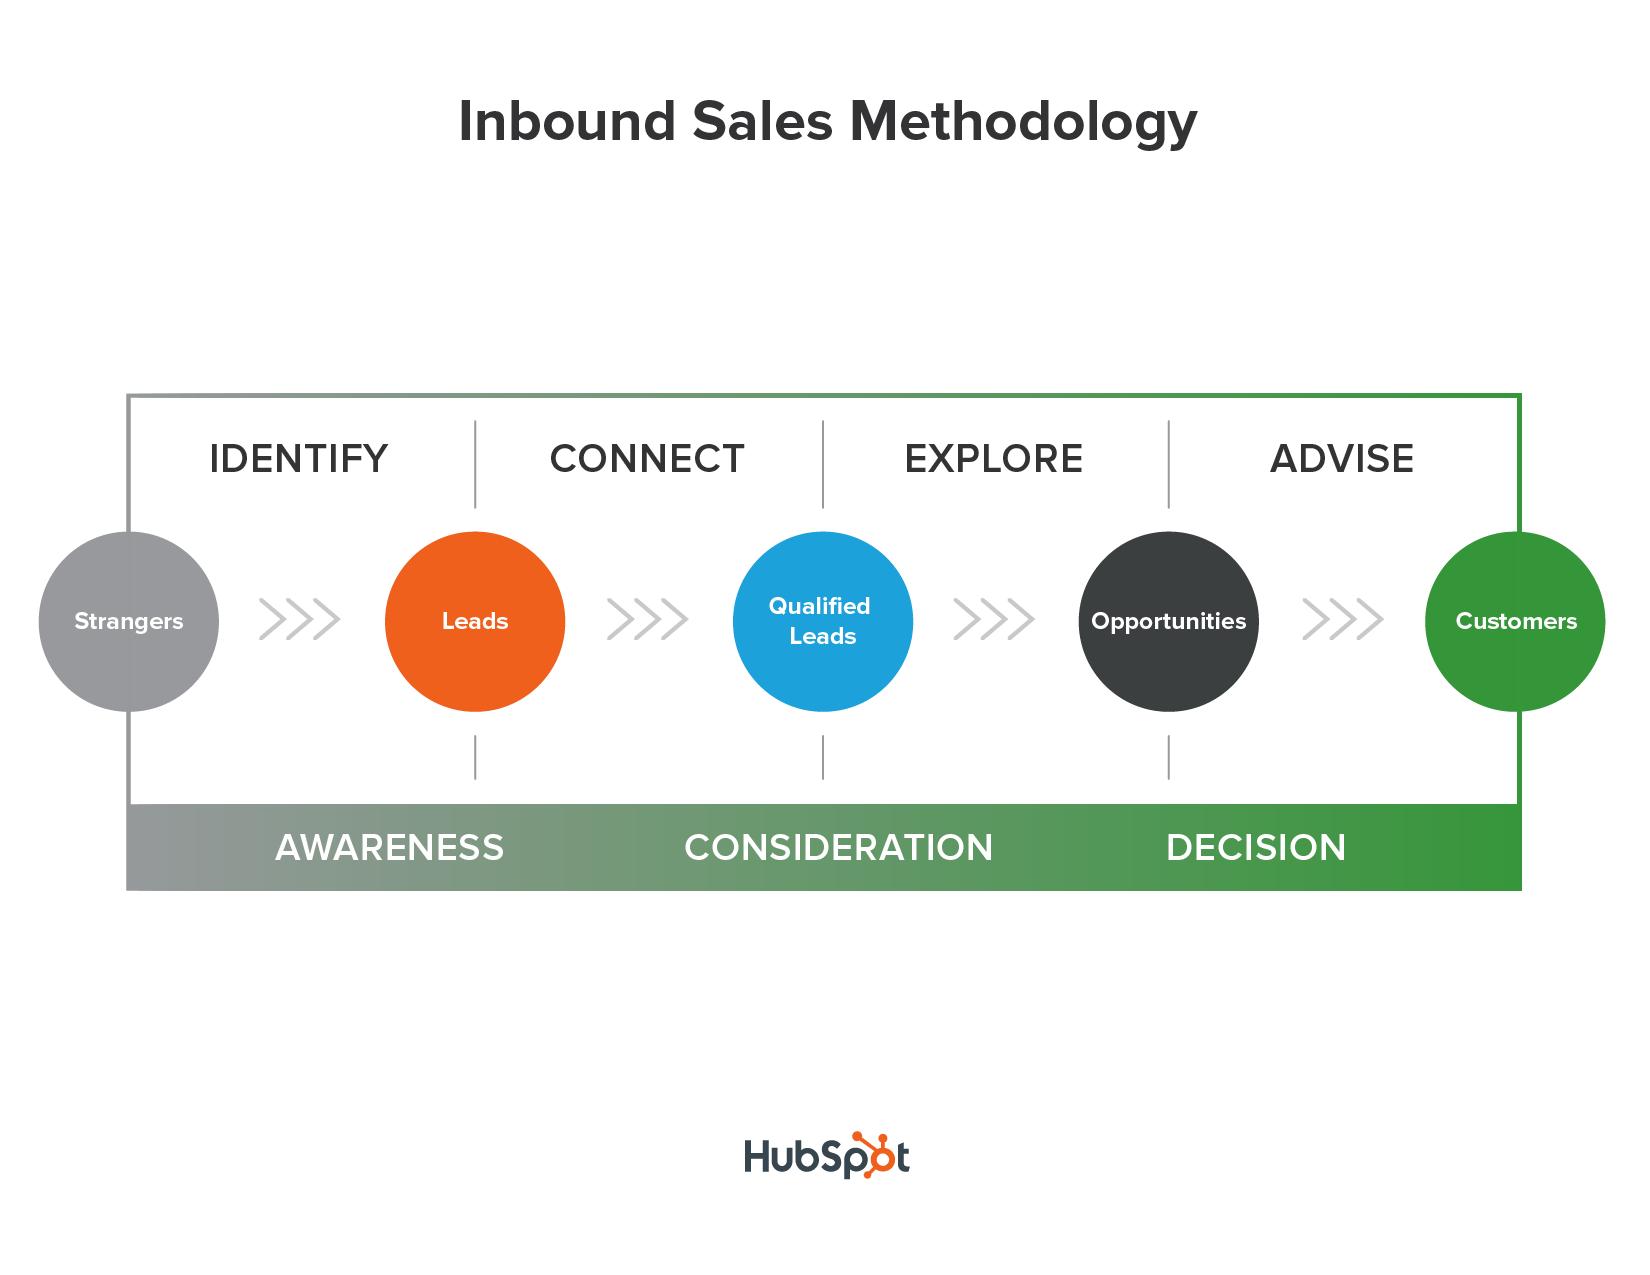 Hubspot_sales_methodology-01.png